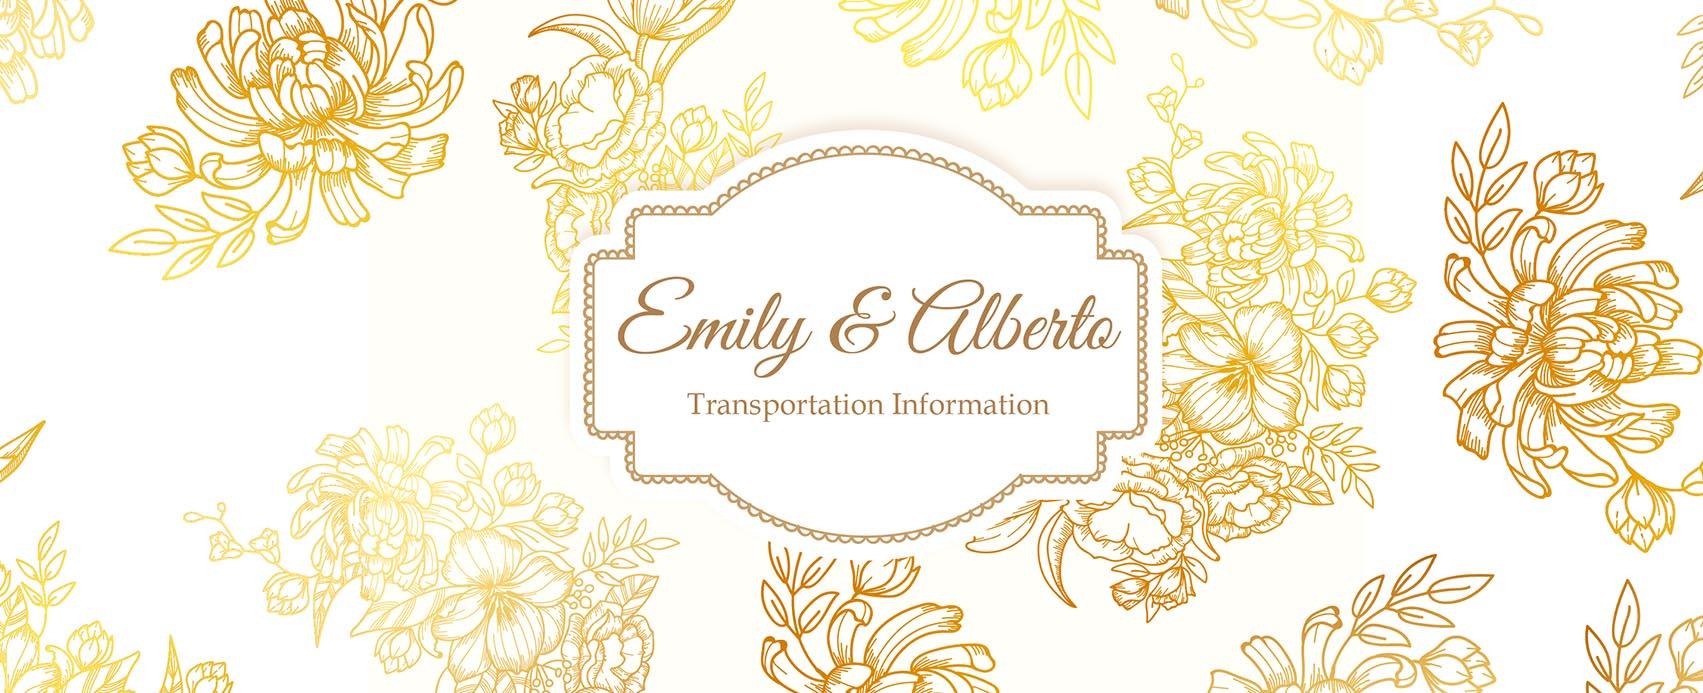 Emily-Alberto-02-medidaweb